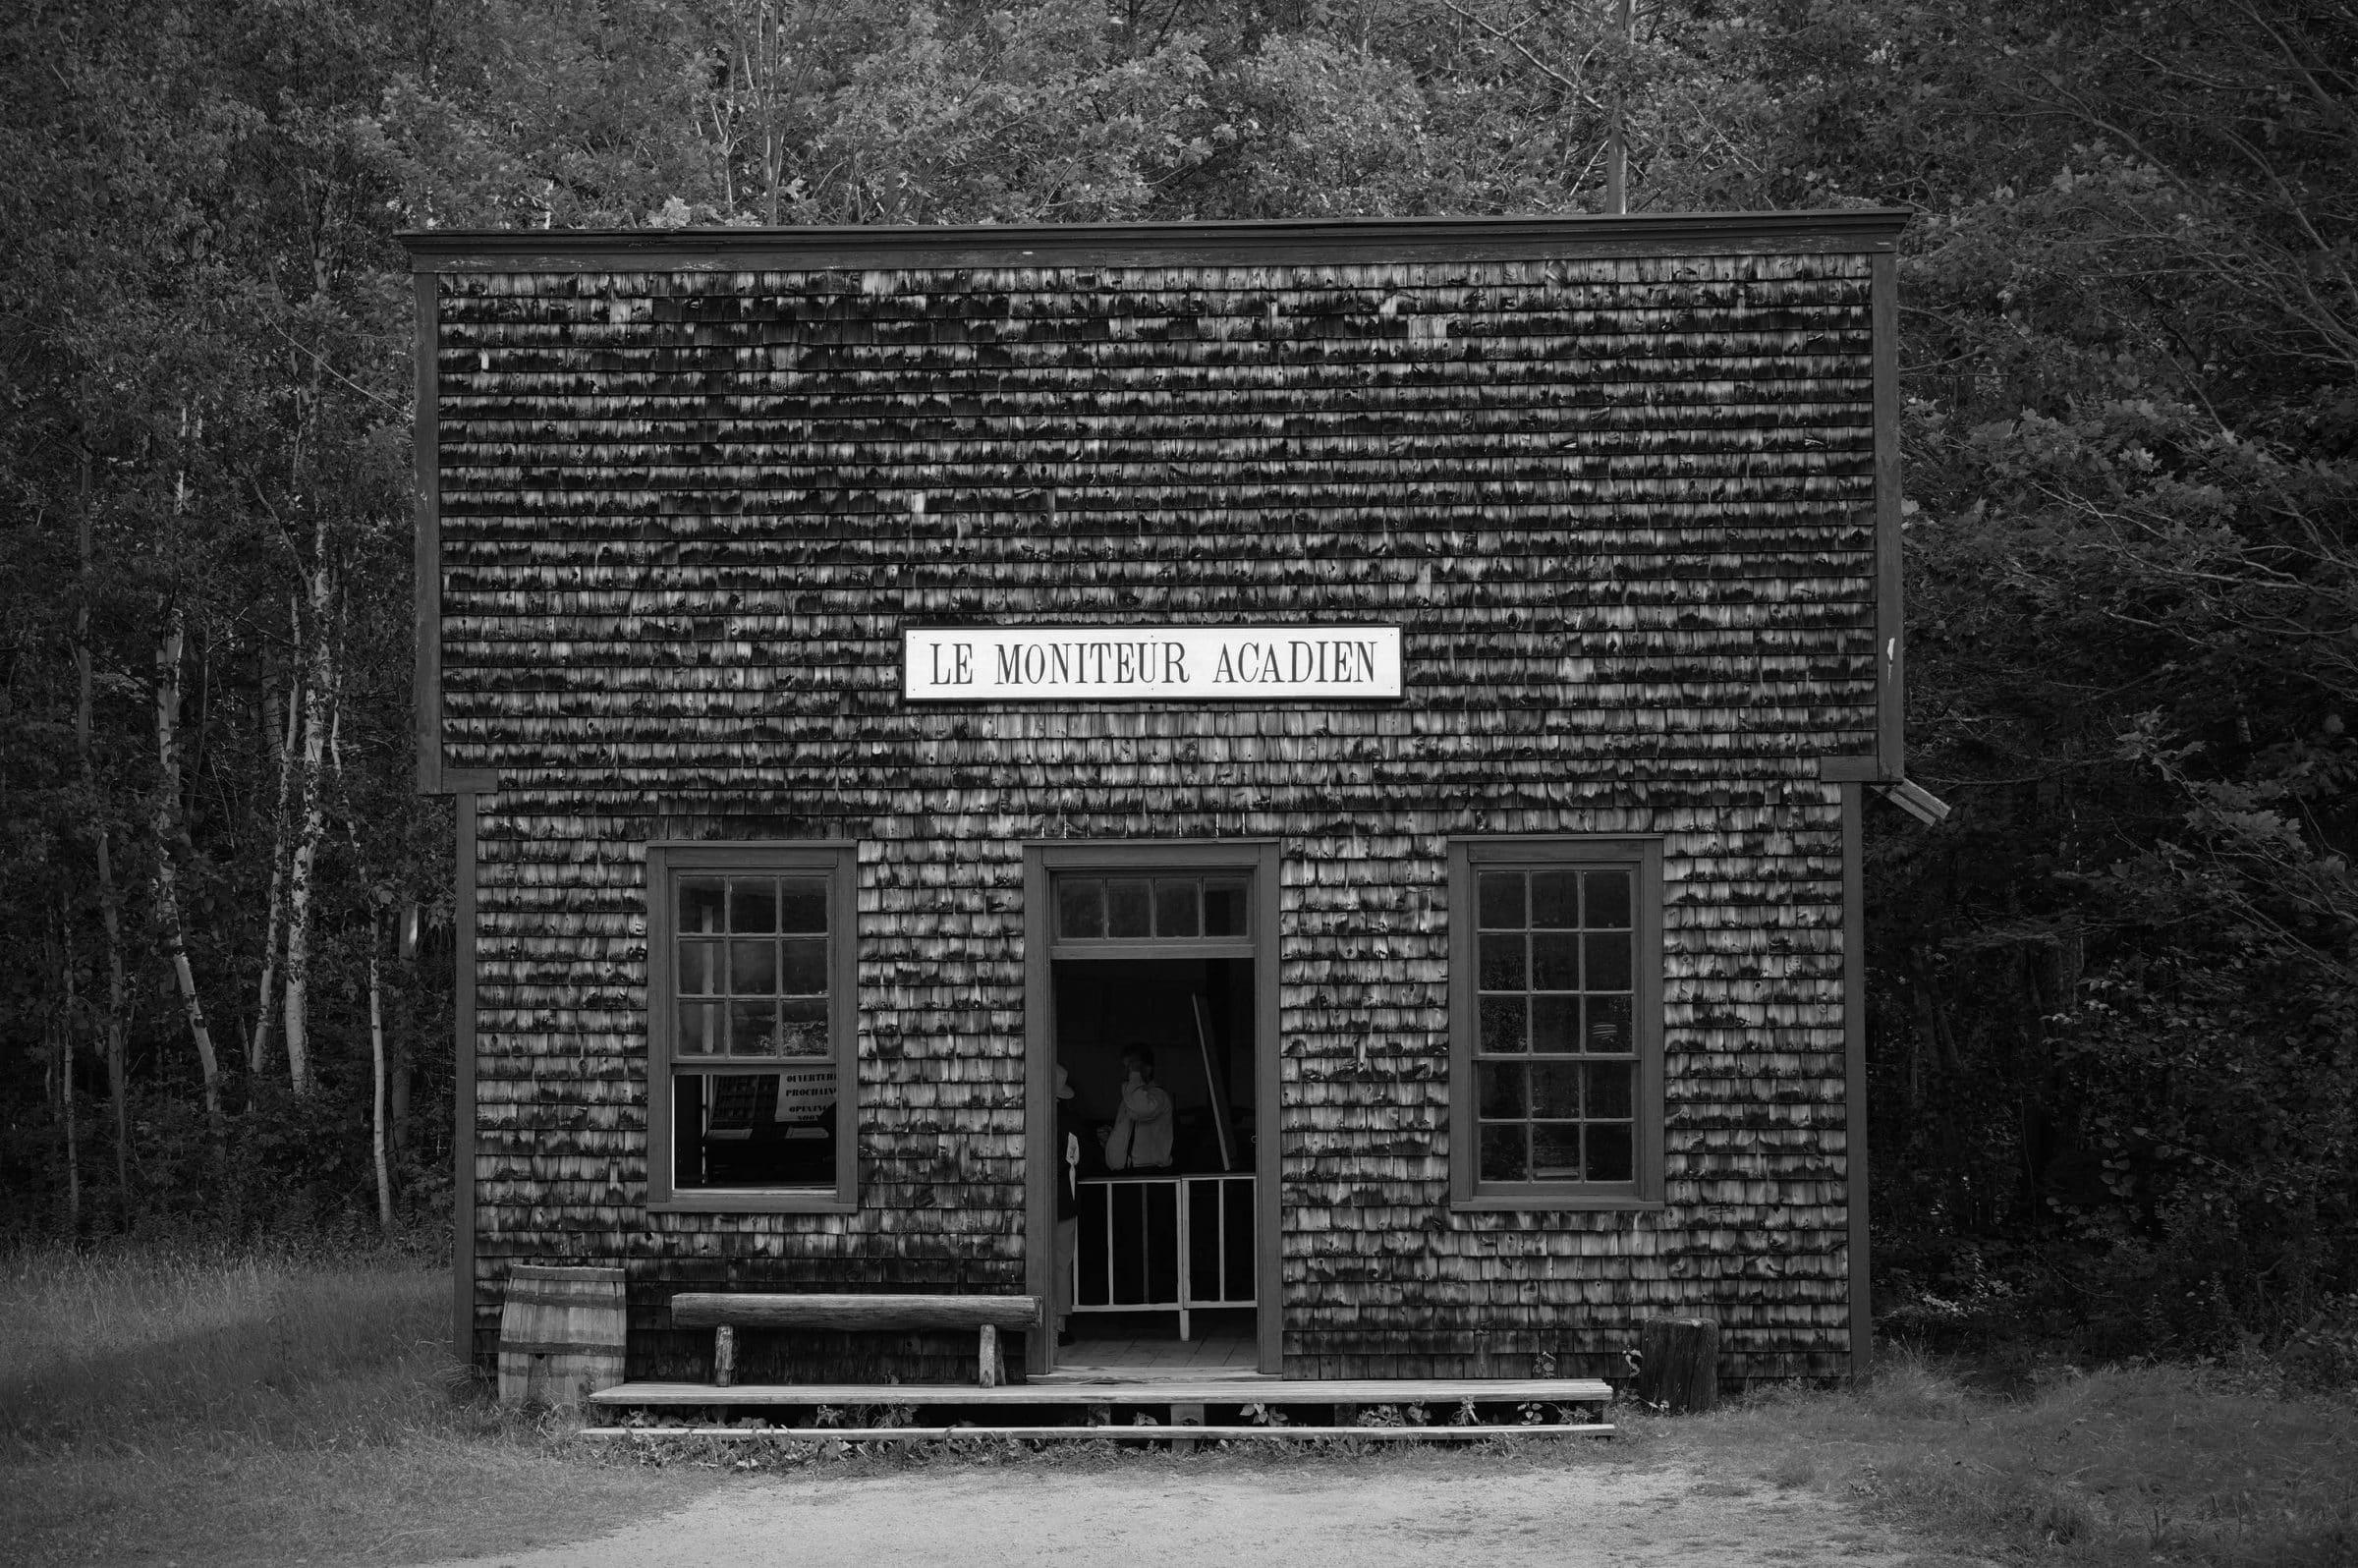 Acadie - Village historique acadien Le moniteur acadien copyright crapaud-chameau.com